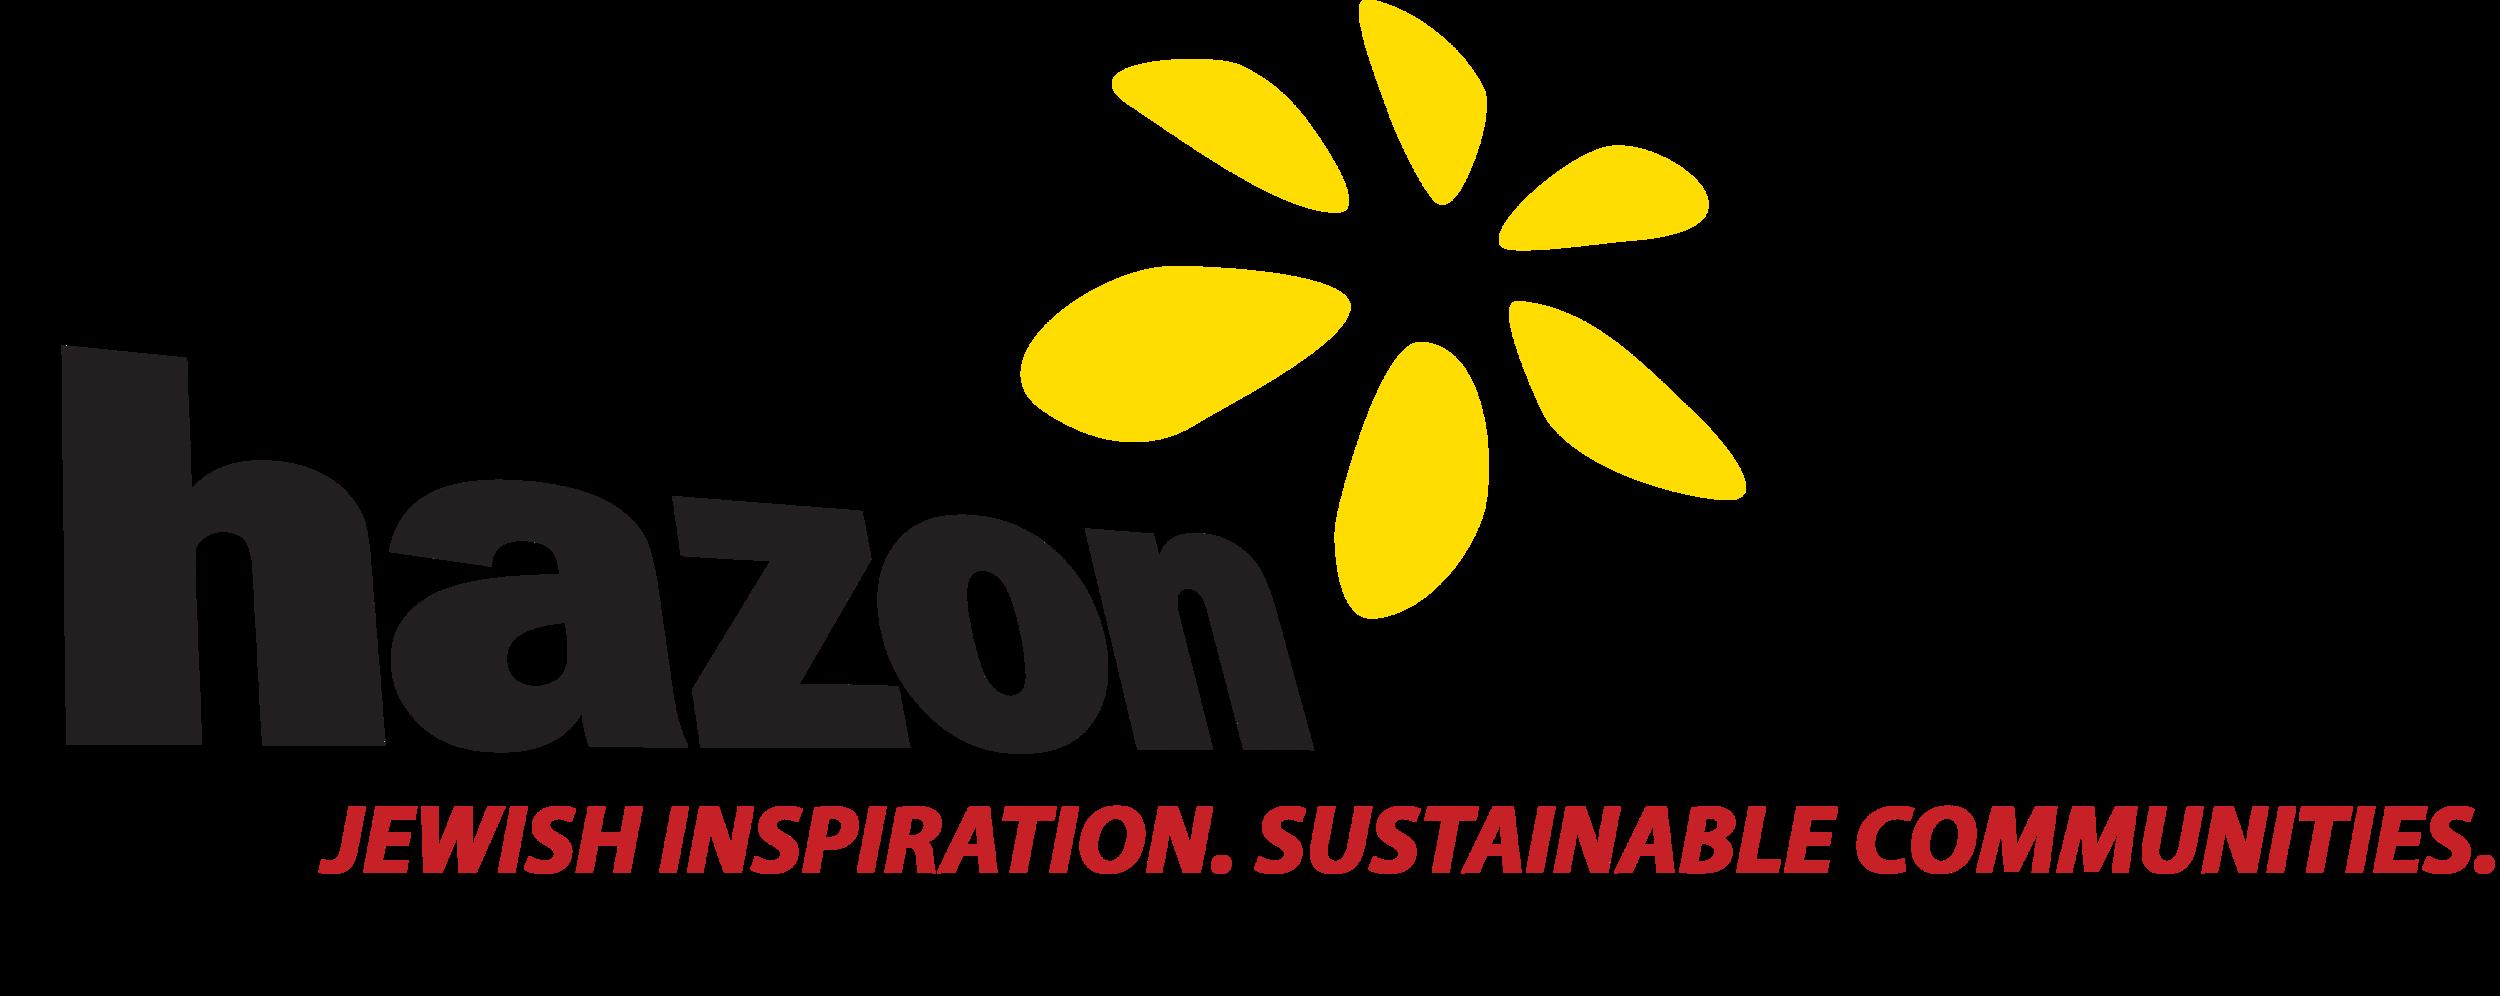 Hazon_Logo_RGB_Transparent.png